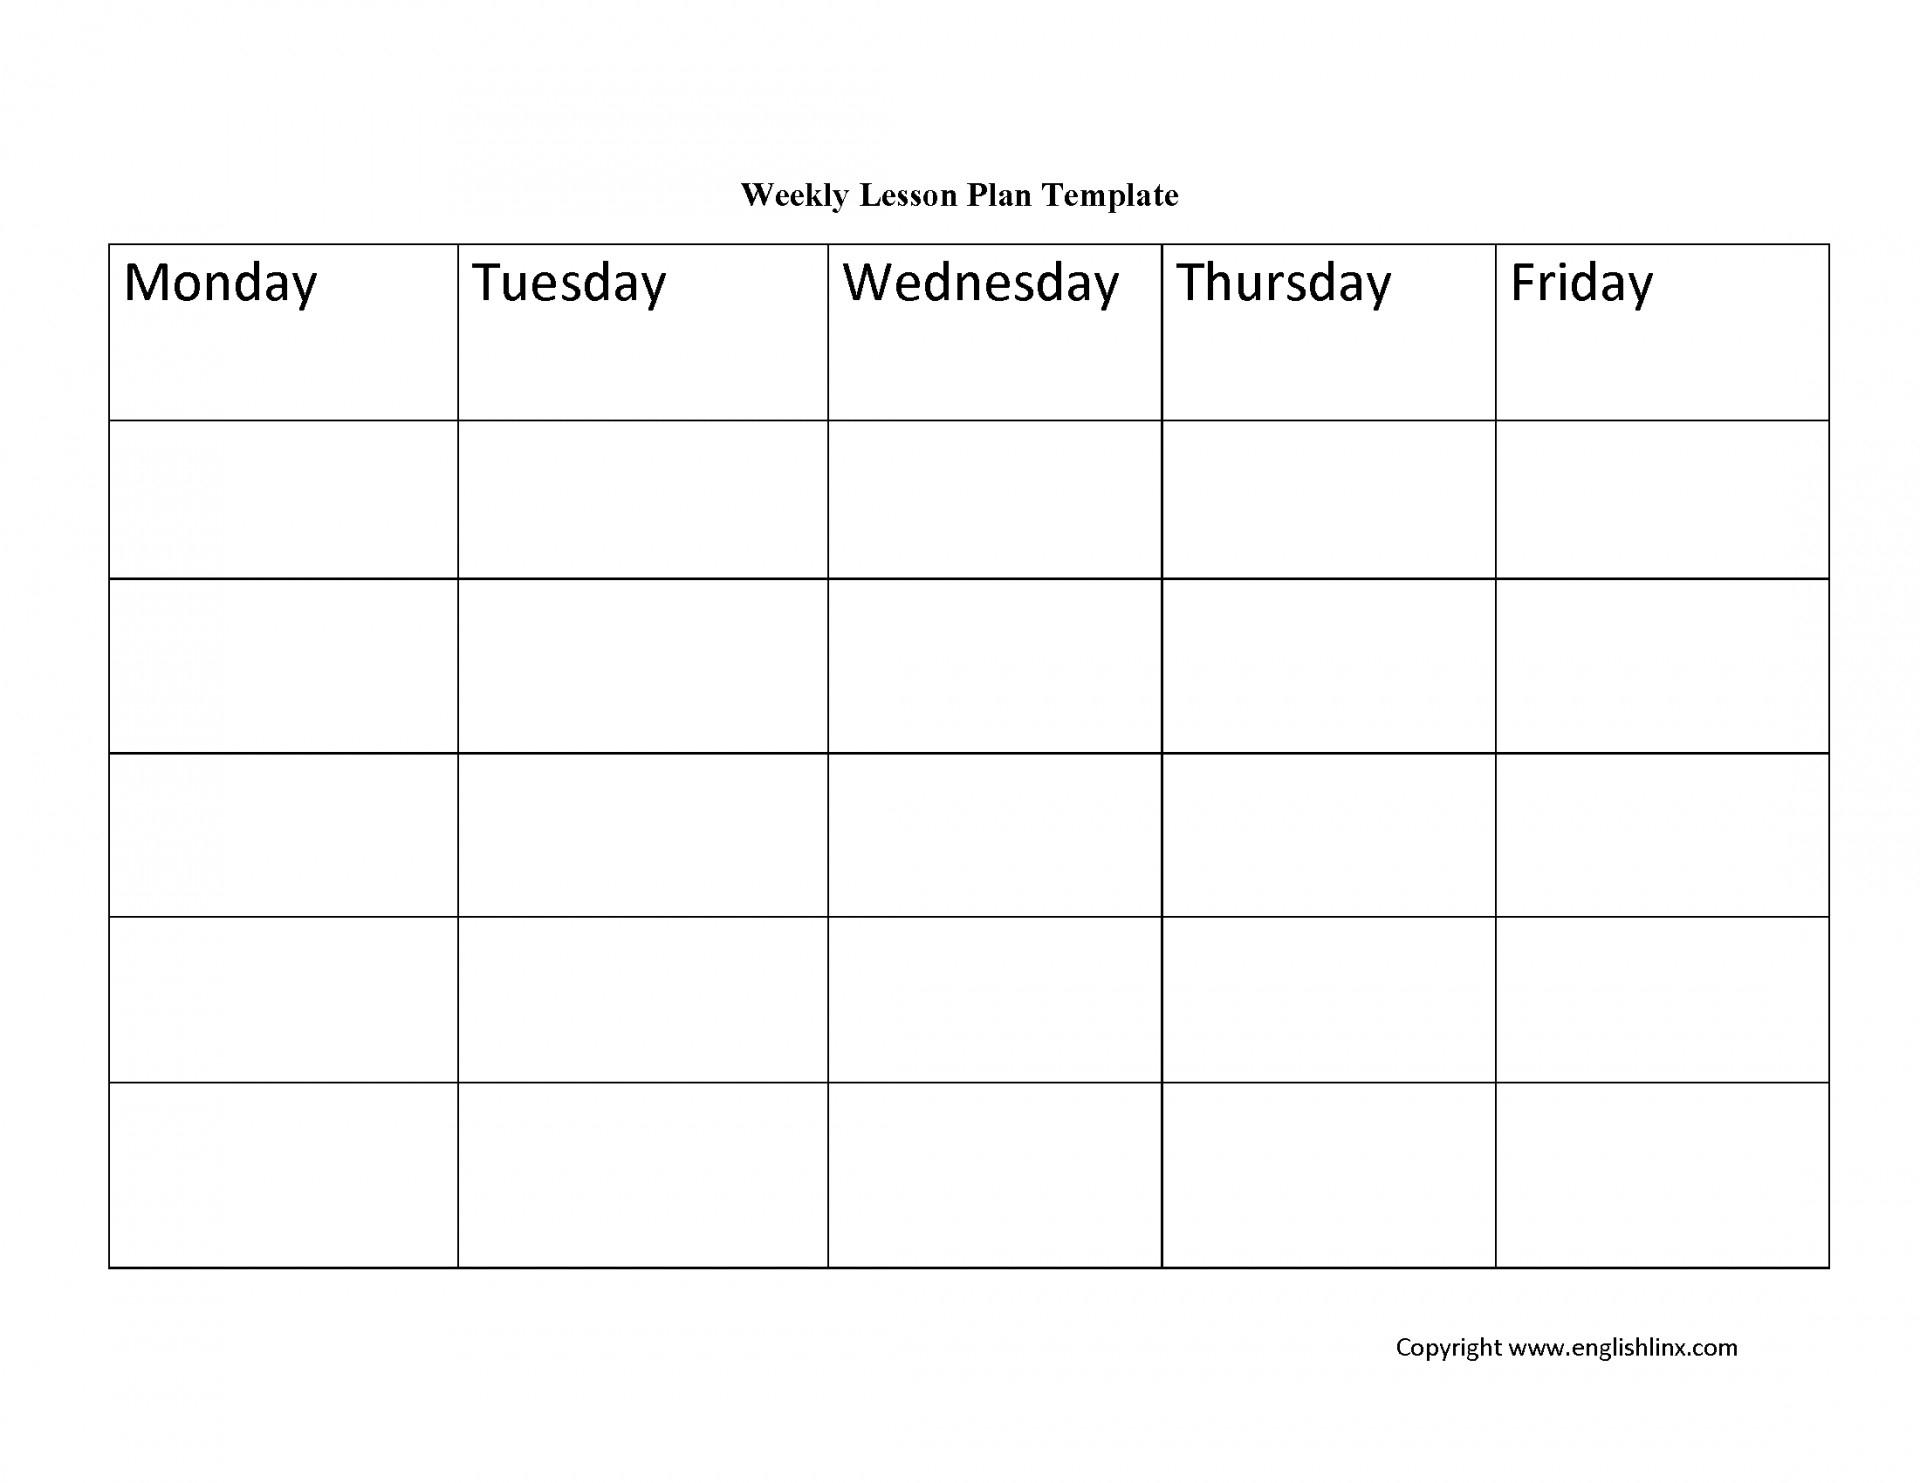 Weekly Lesson Plan Blank Template   Example Calendar Printable